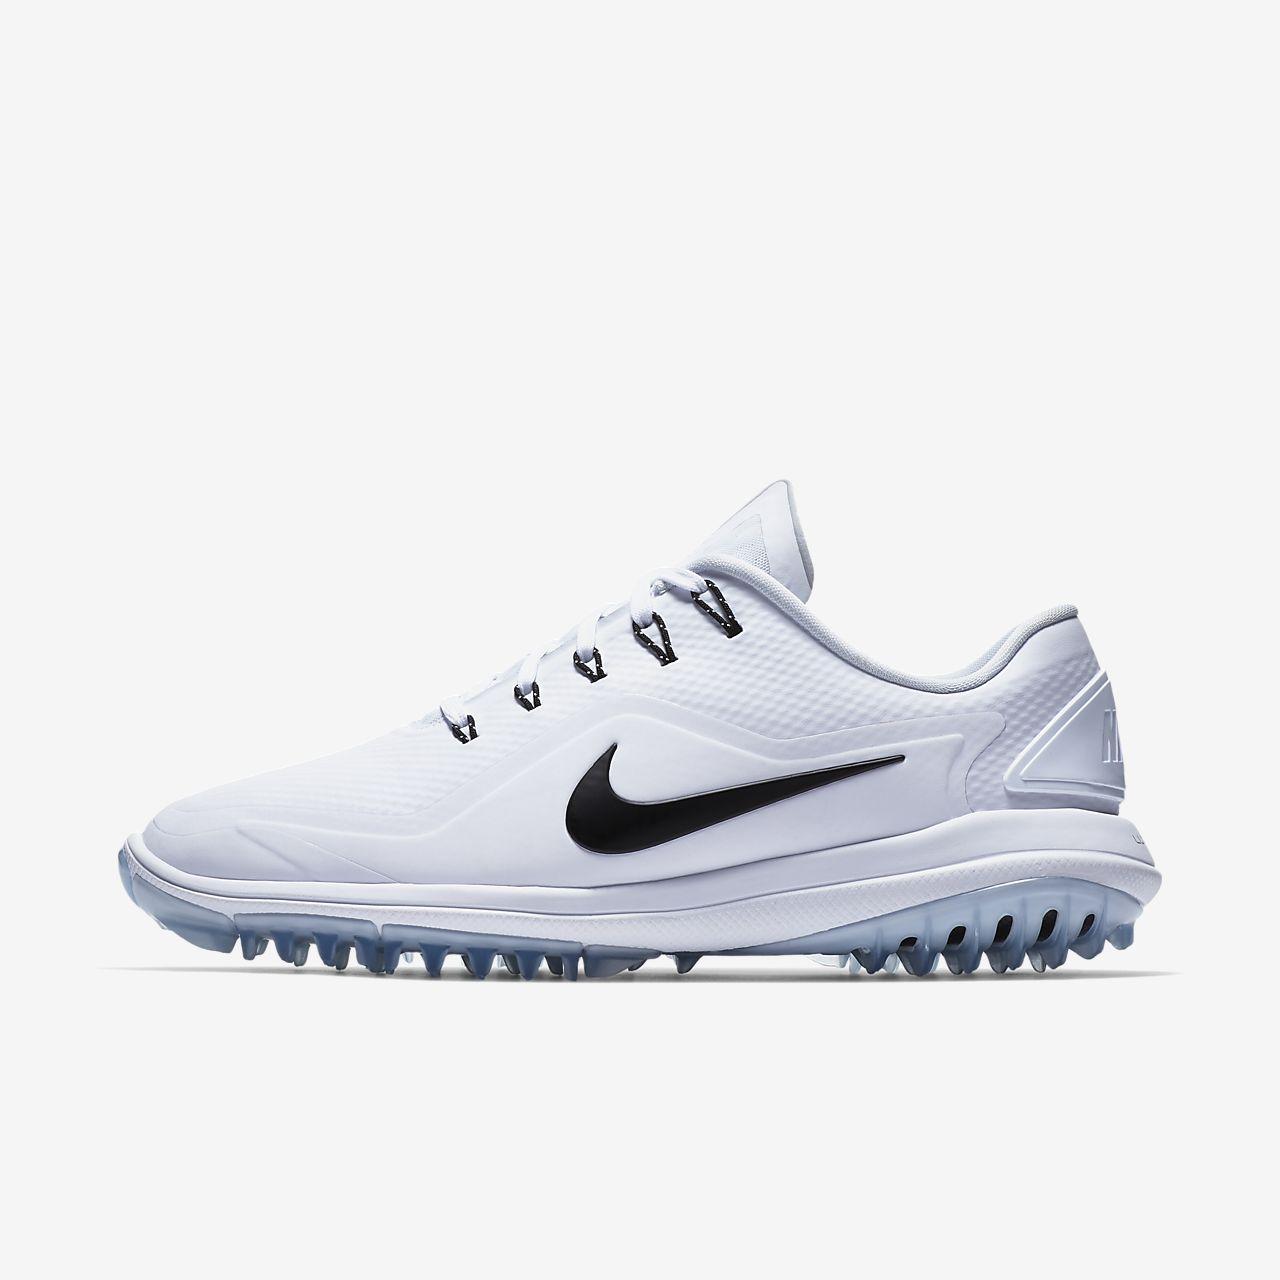 quality design 93d8f 8ed8f ... Golfsko Nike Lunar Control Vapor 2 för kvinnor